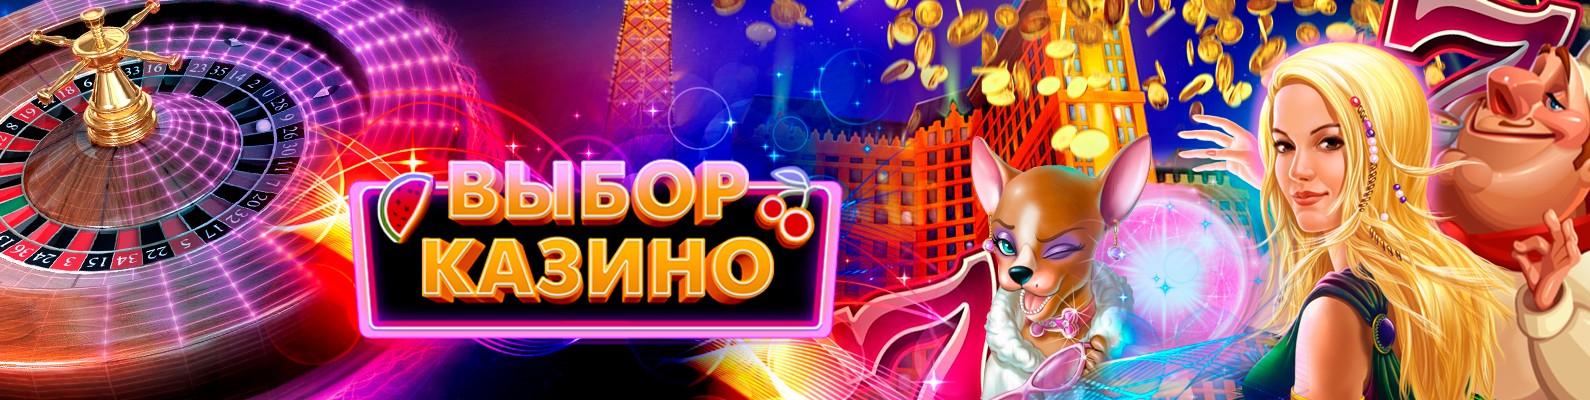 Турнир в казино онлайн зеркала онлайн казино вулкан